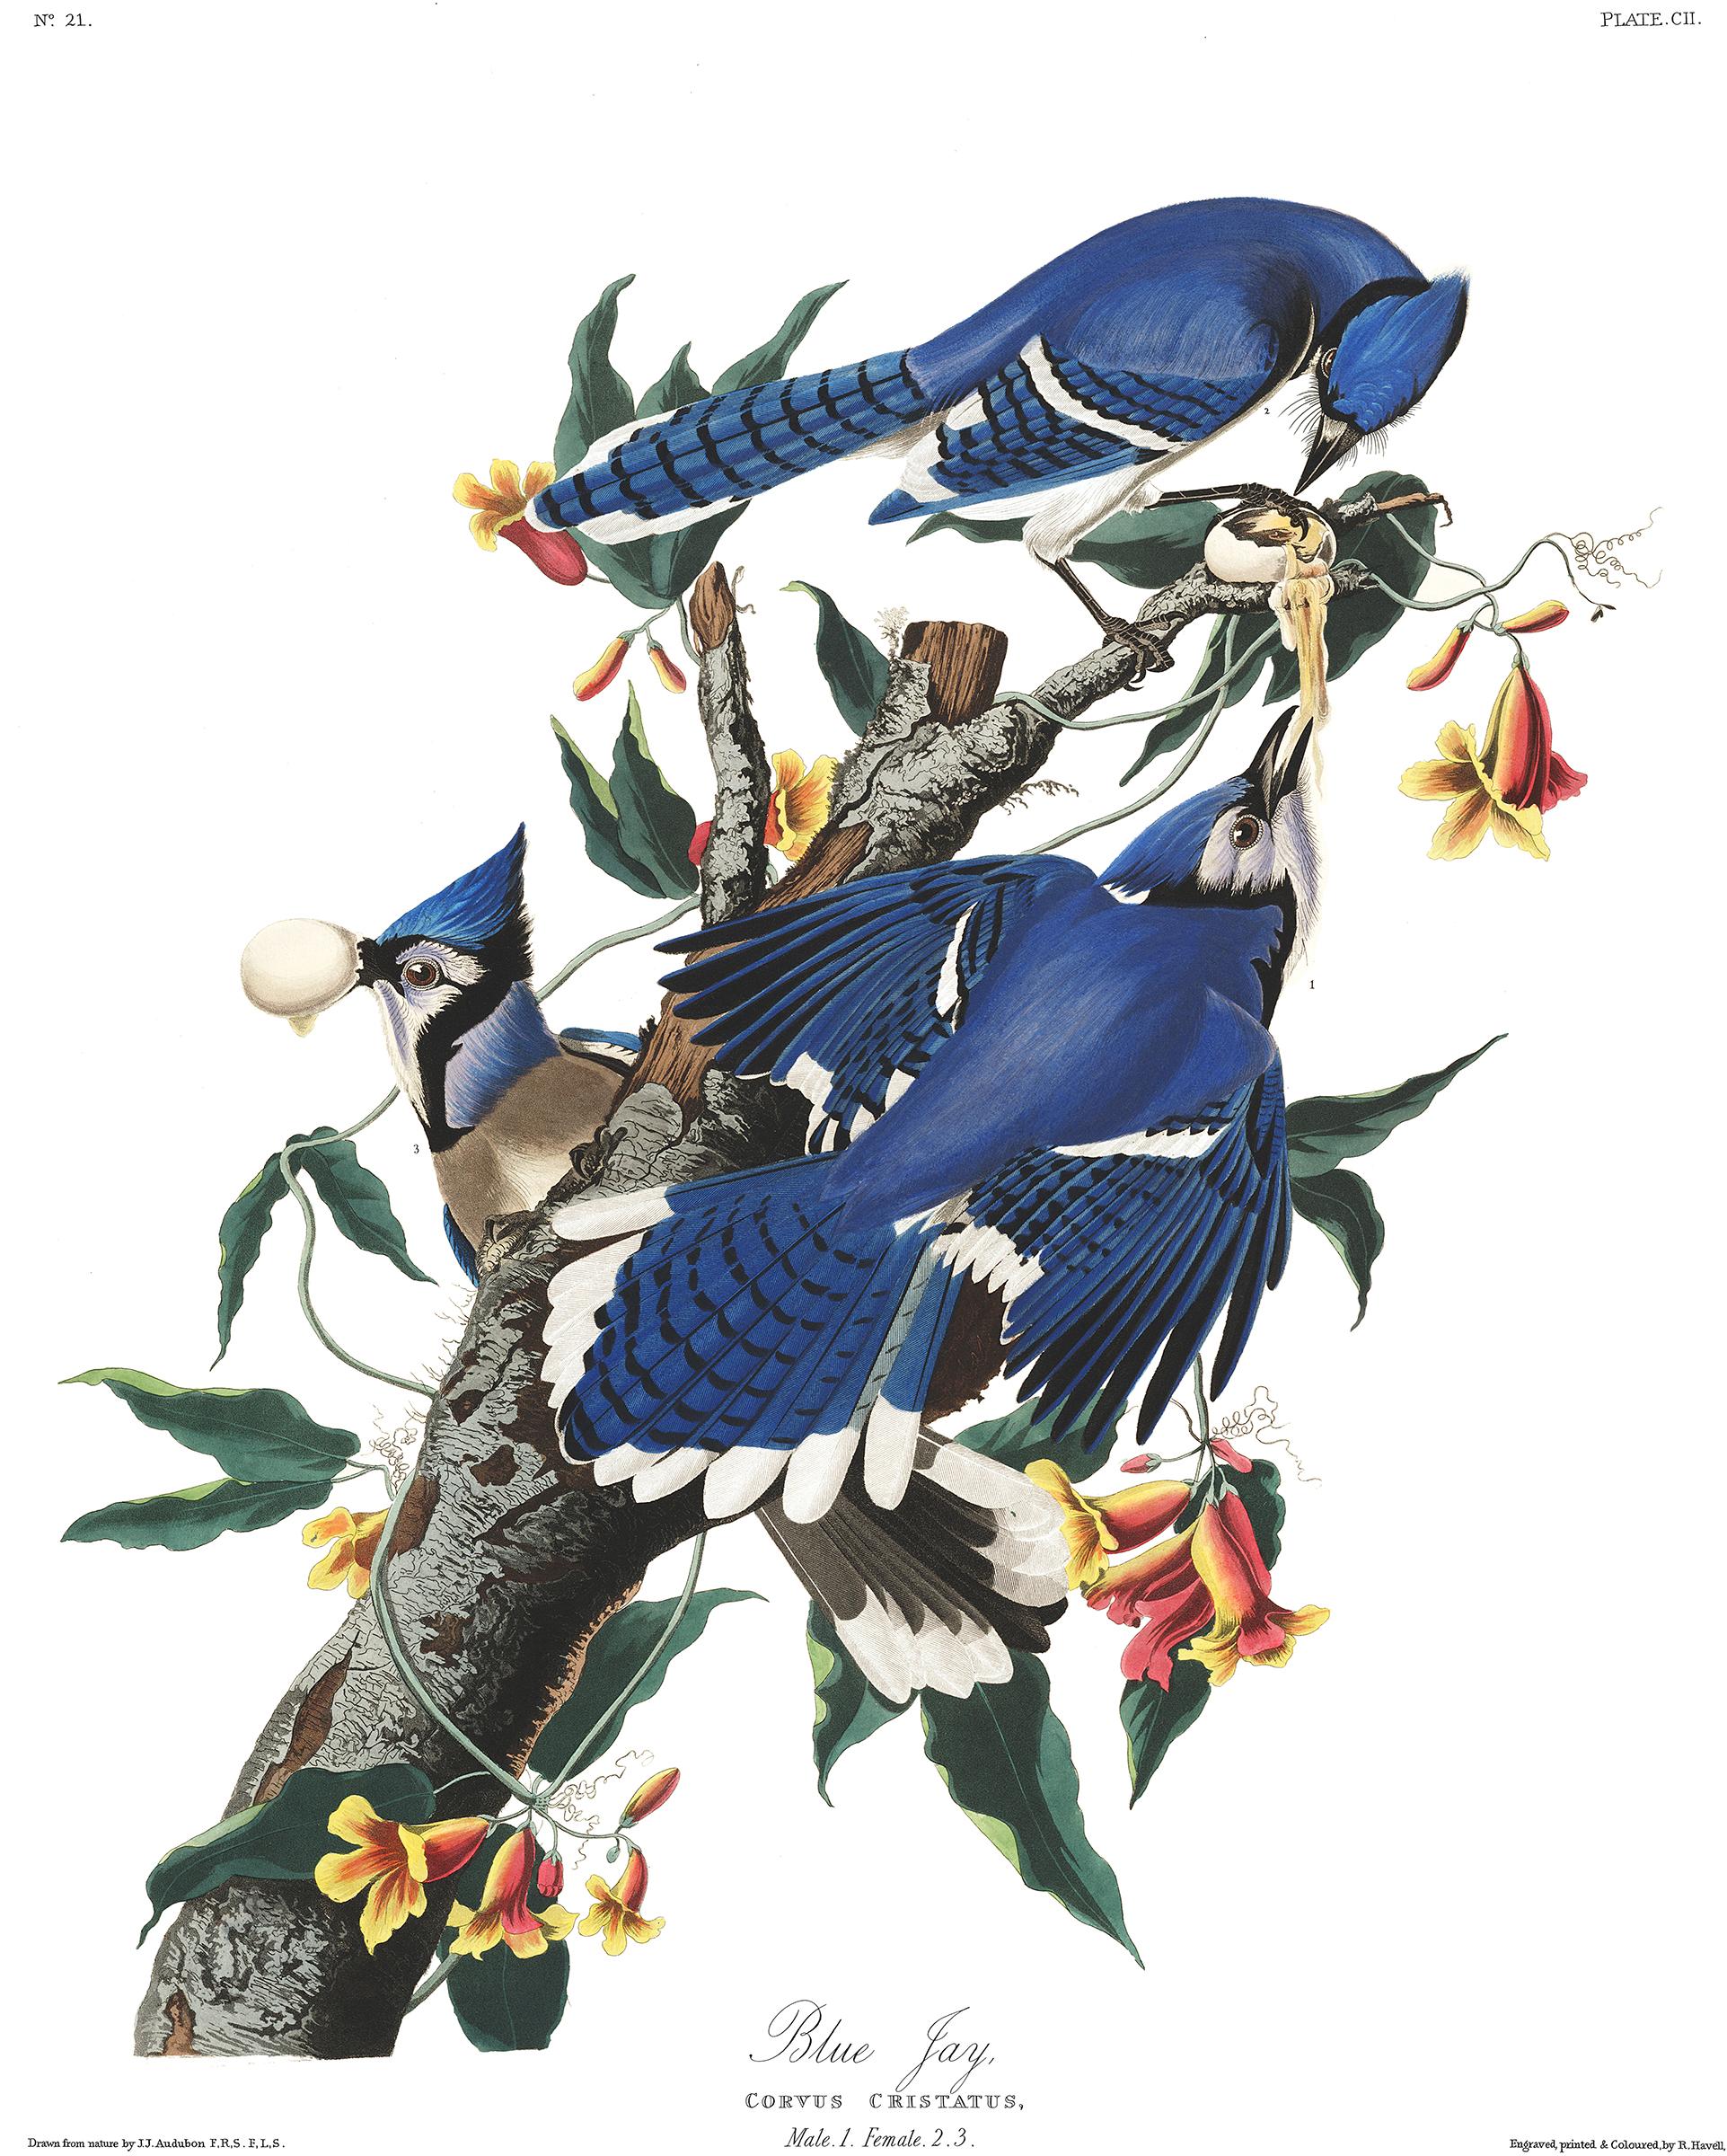 Blue Jay plate. Illustration: Courtesy of the John James Audubon Center at Mill Grove, Montgomery County Audubon Collection, and Zebra Publishing